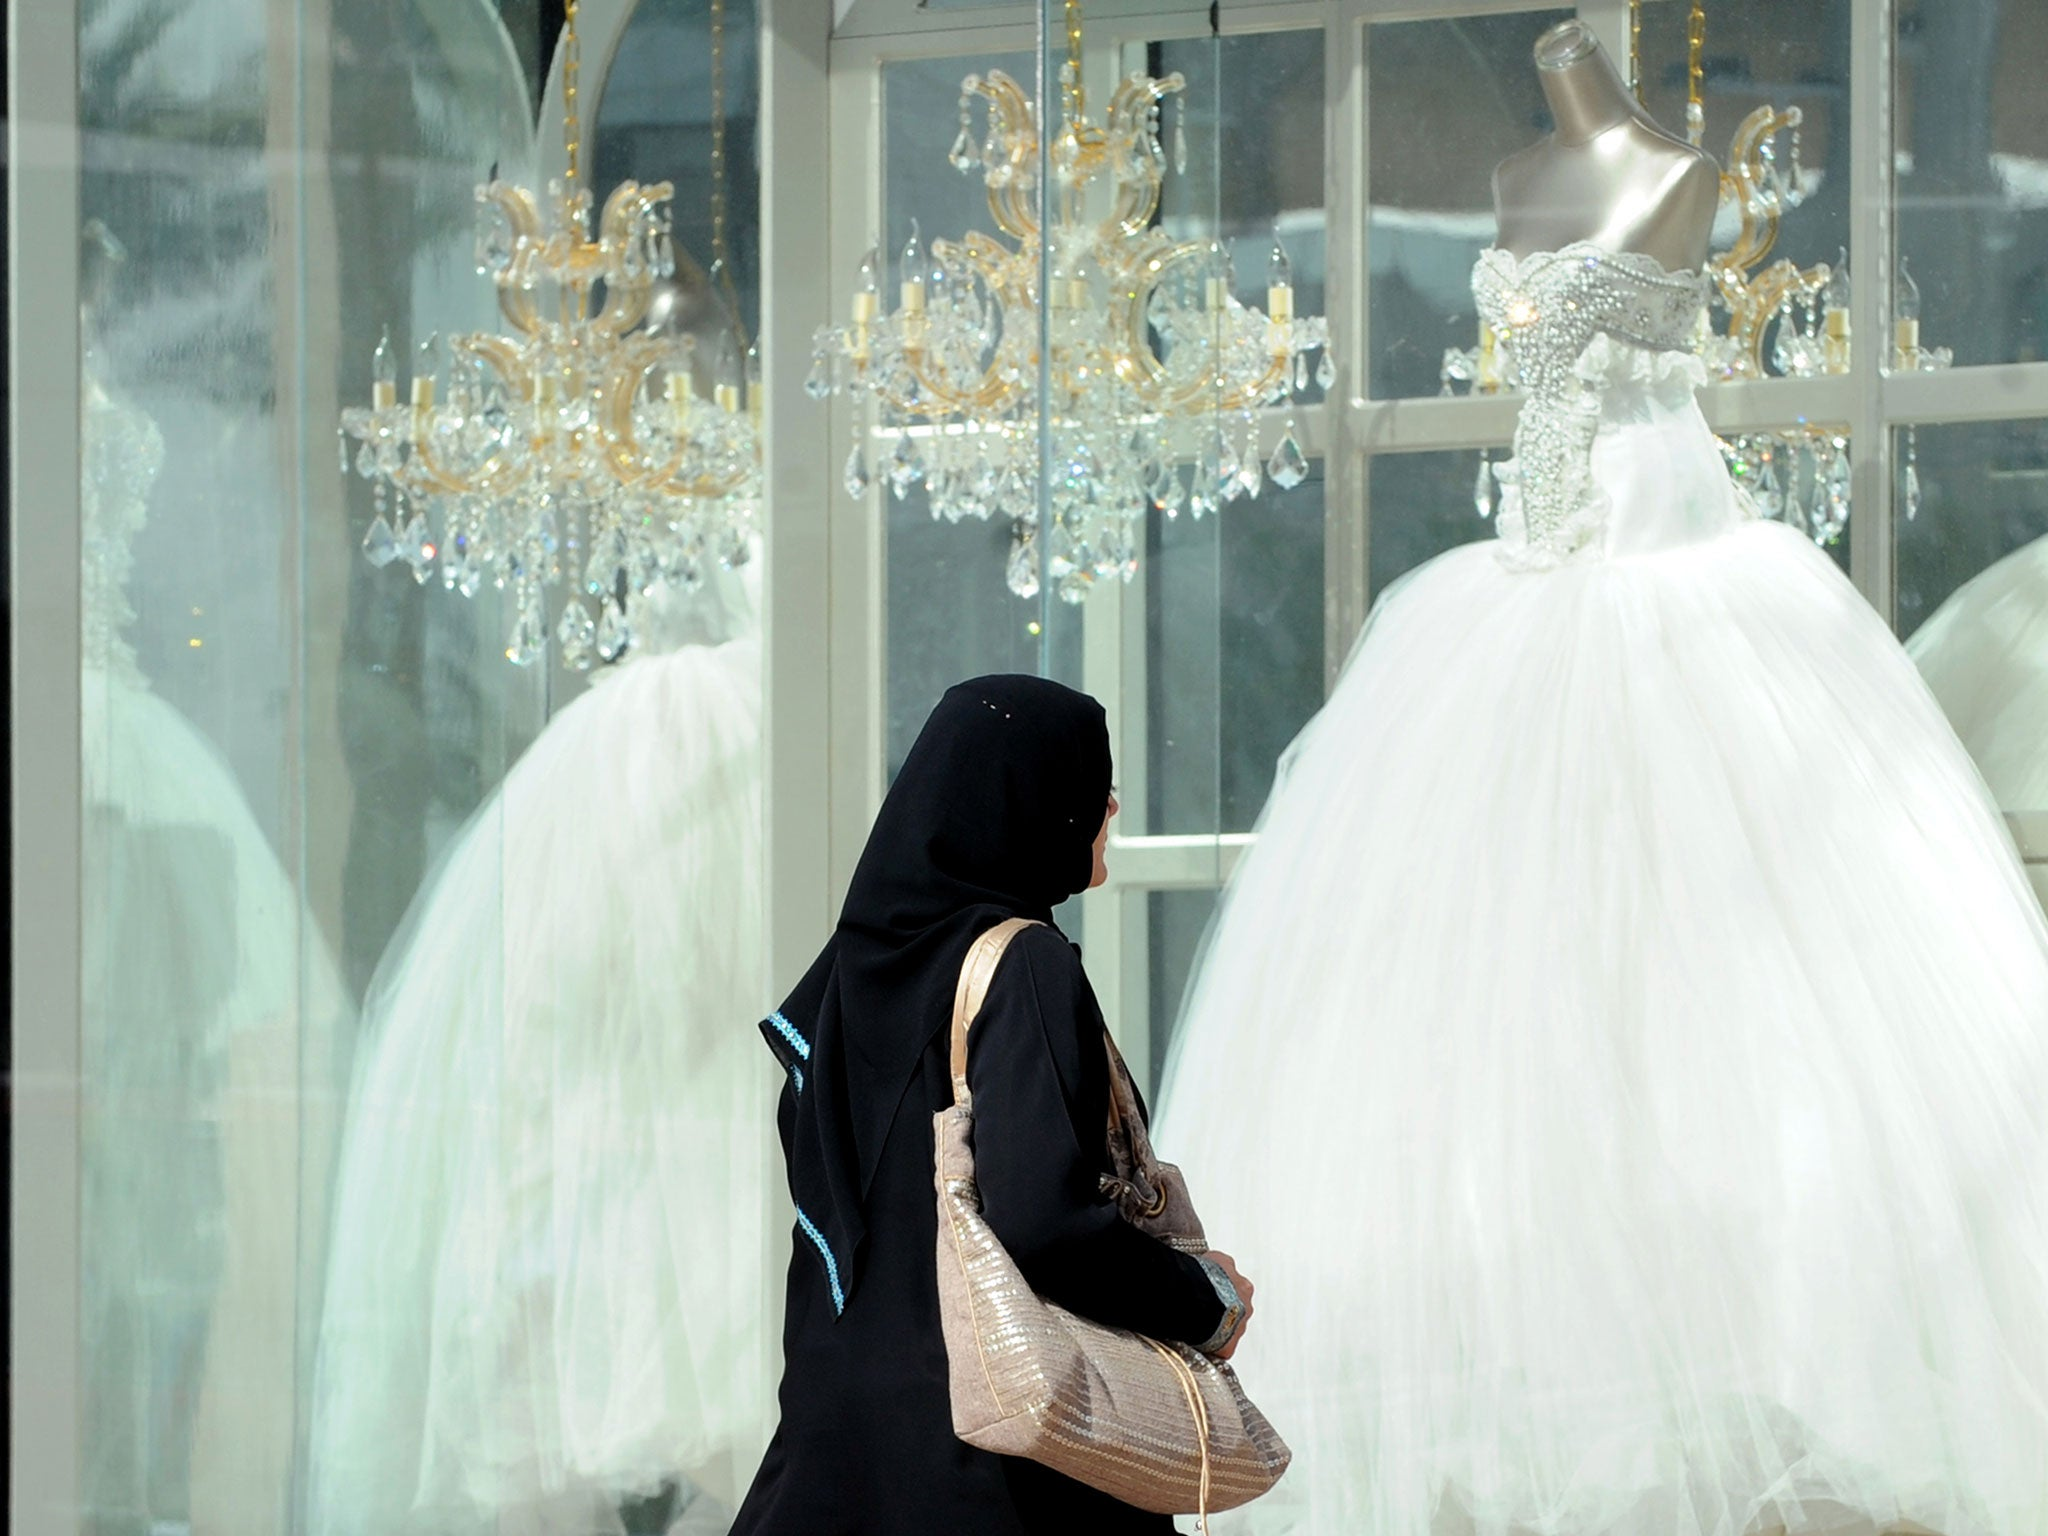 Saudi judge orders eig...